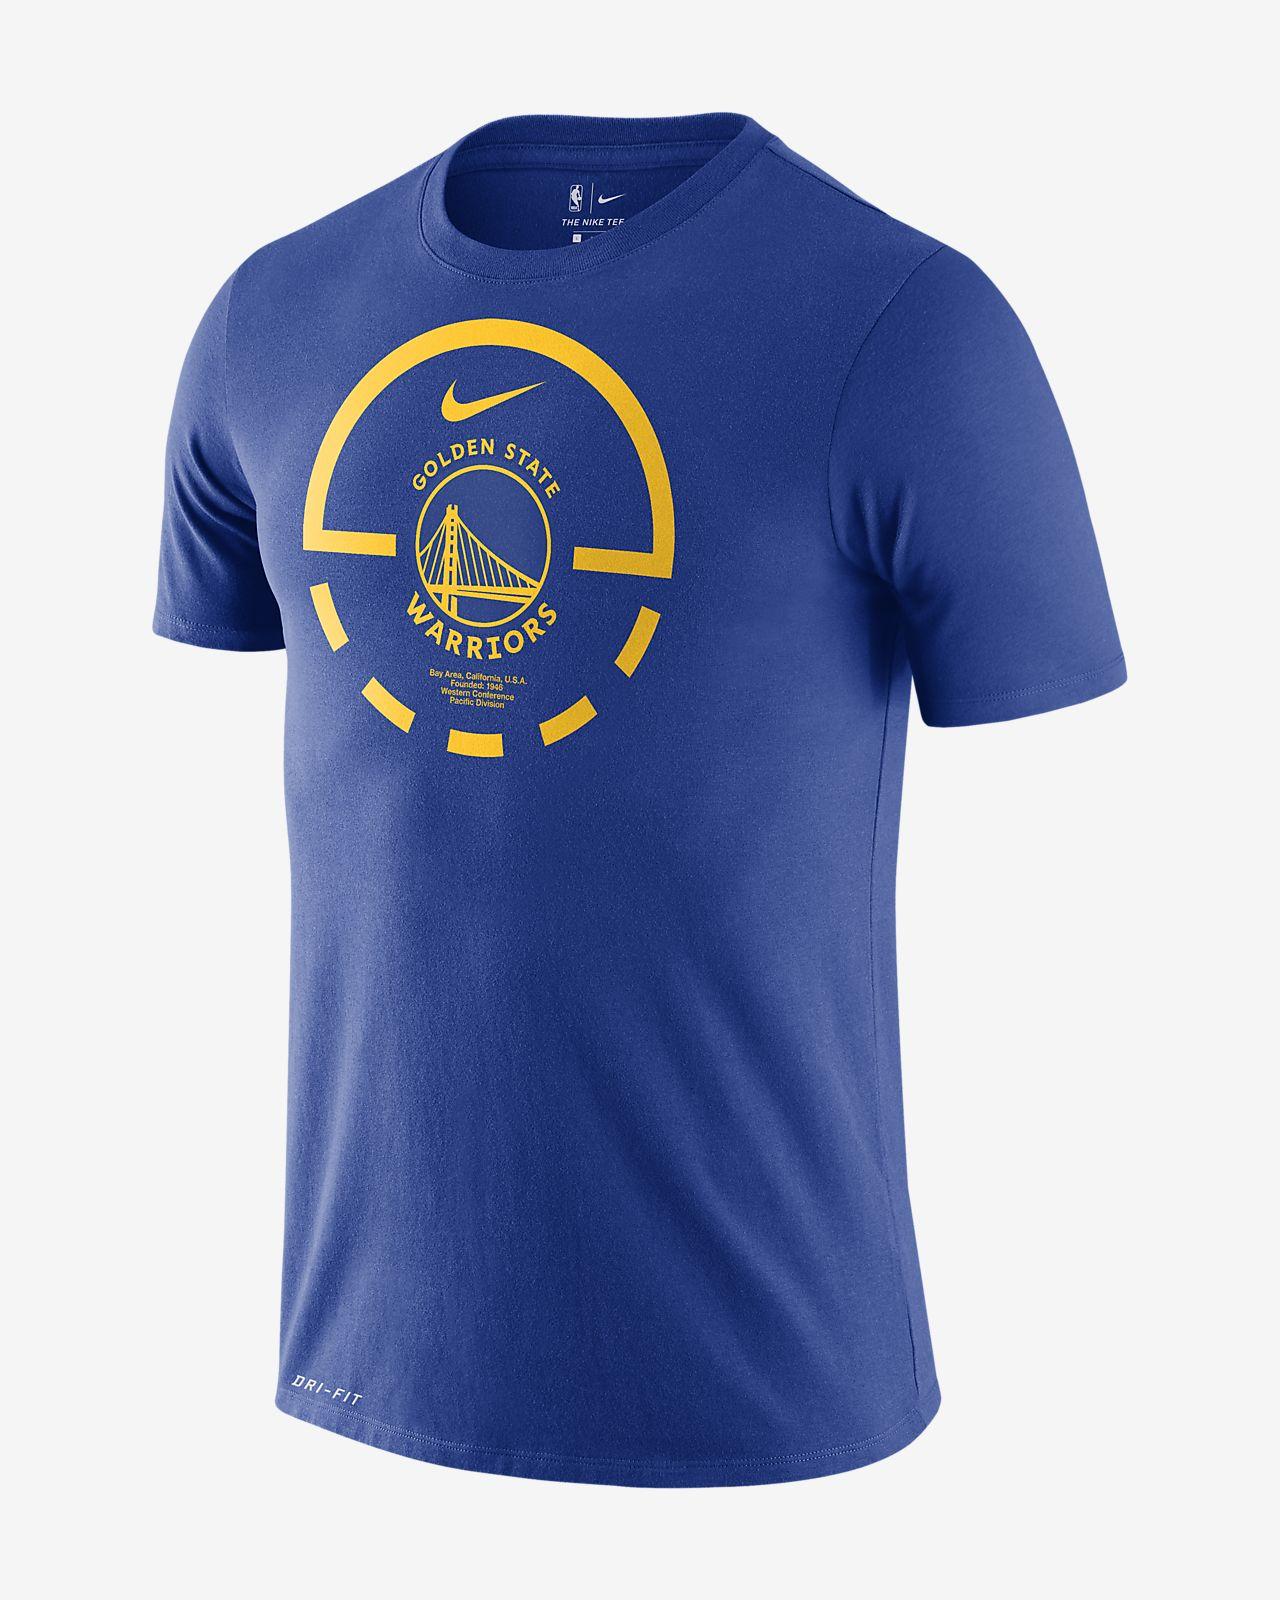 Golden State Warriors Nike Dri-FIT Men's NBA T-Shirt